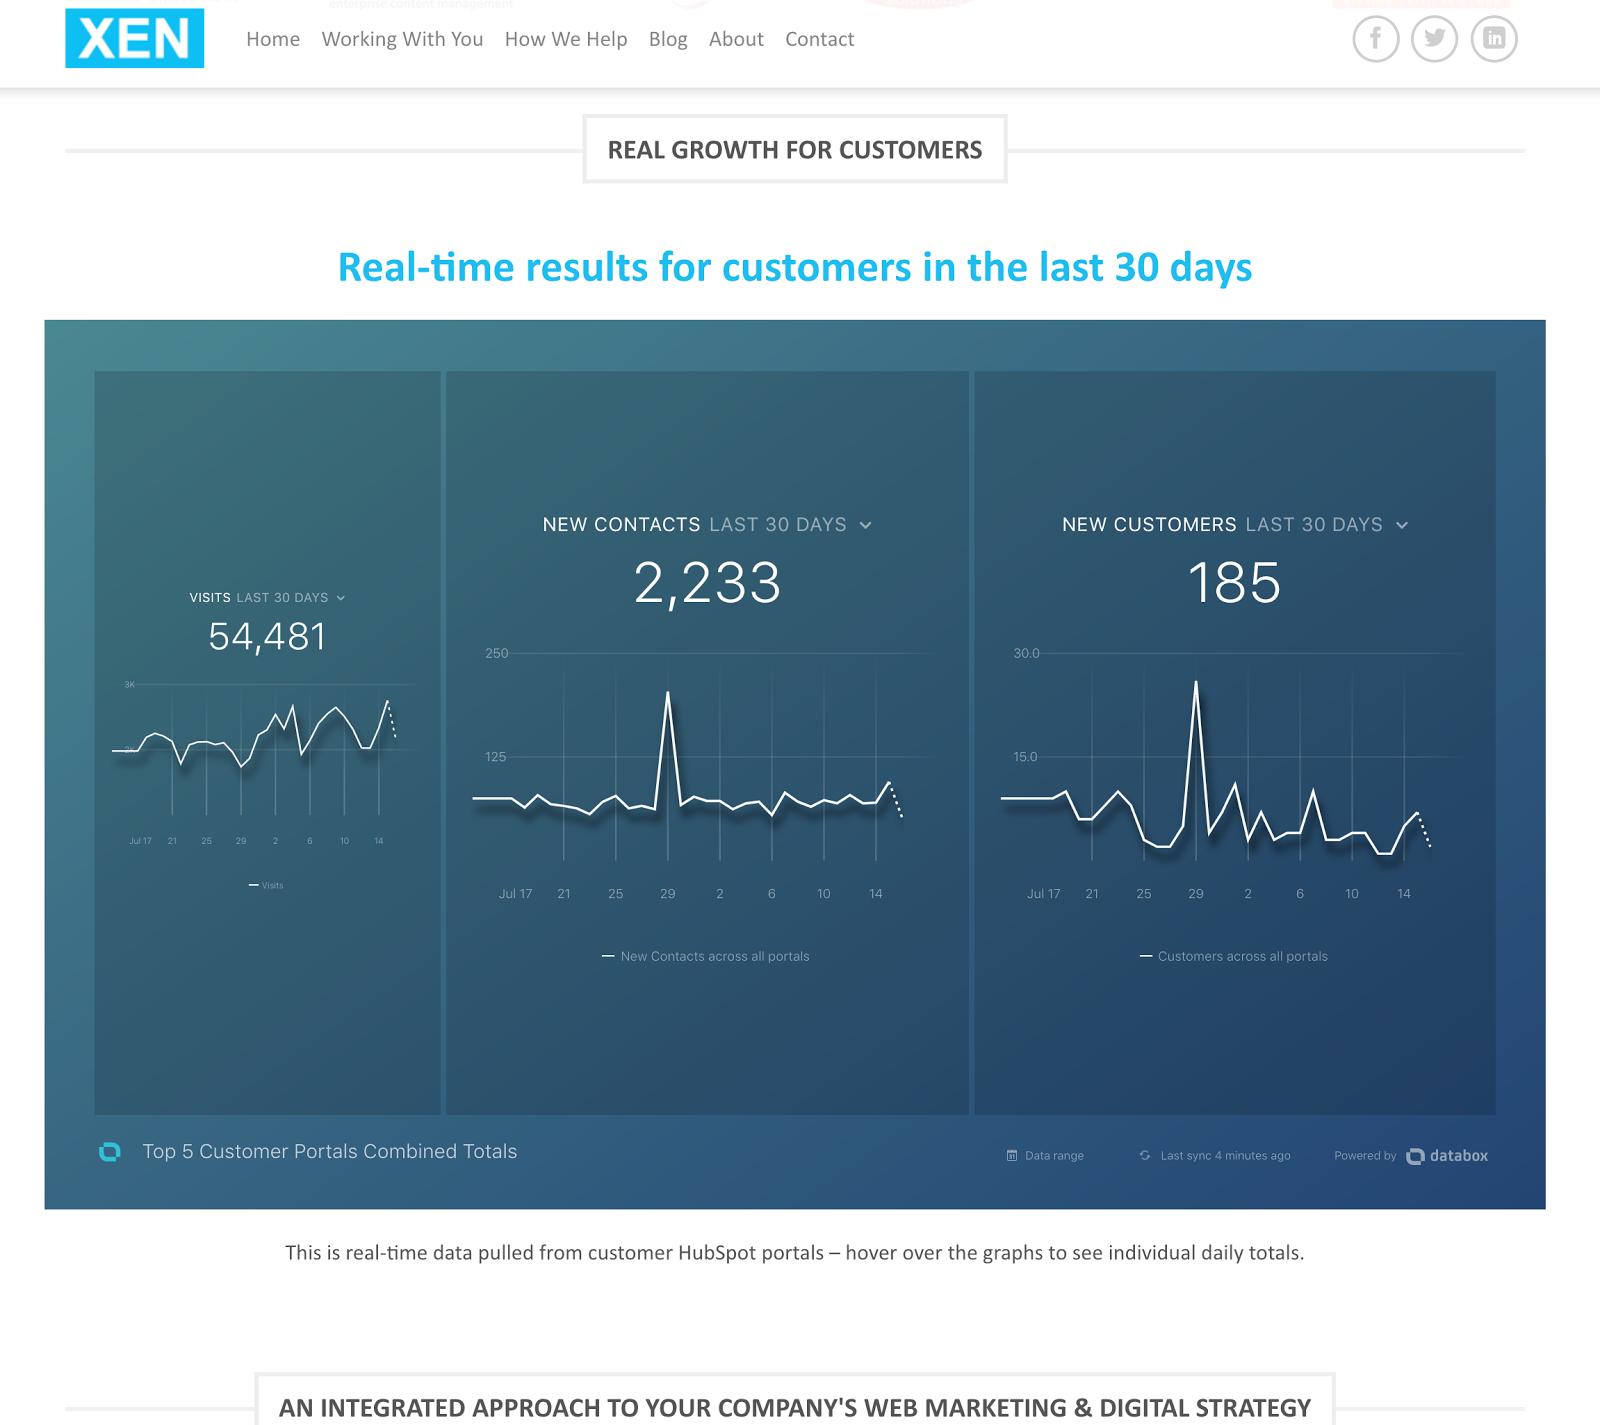 xen home page